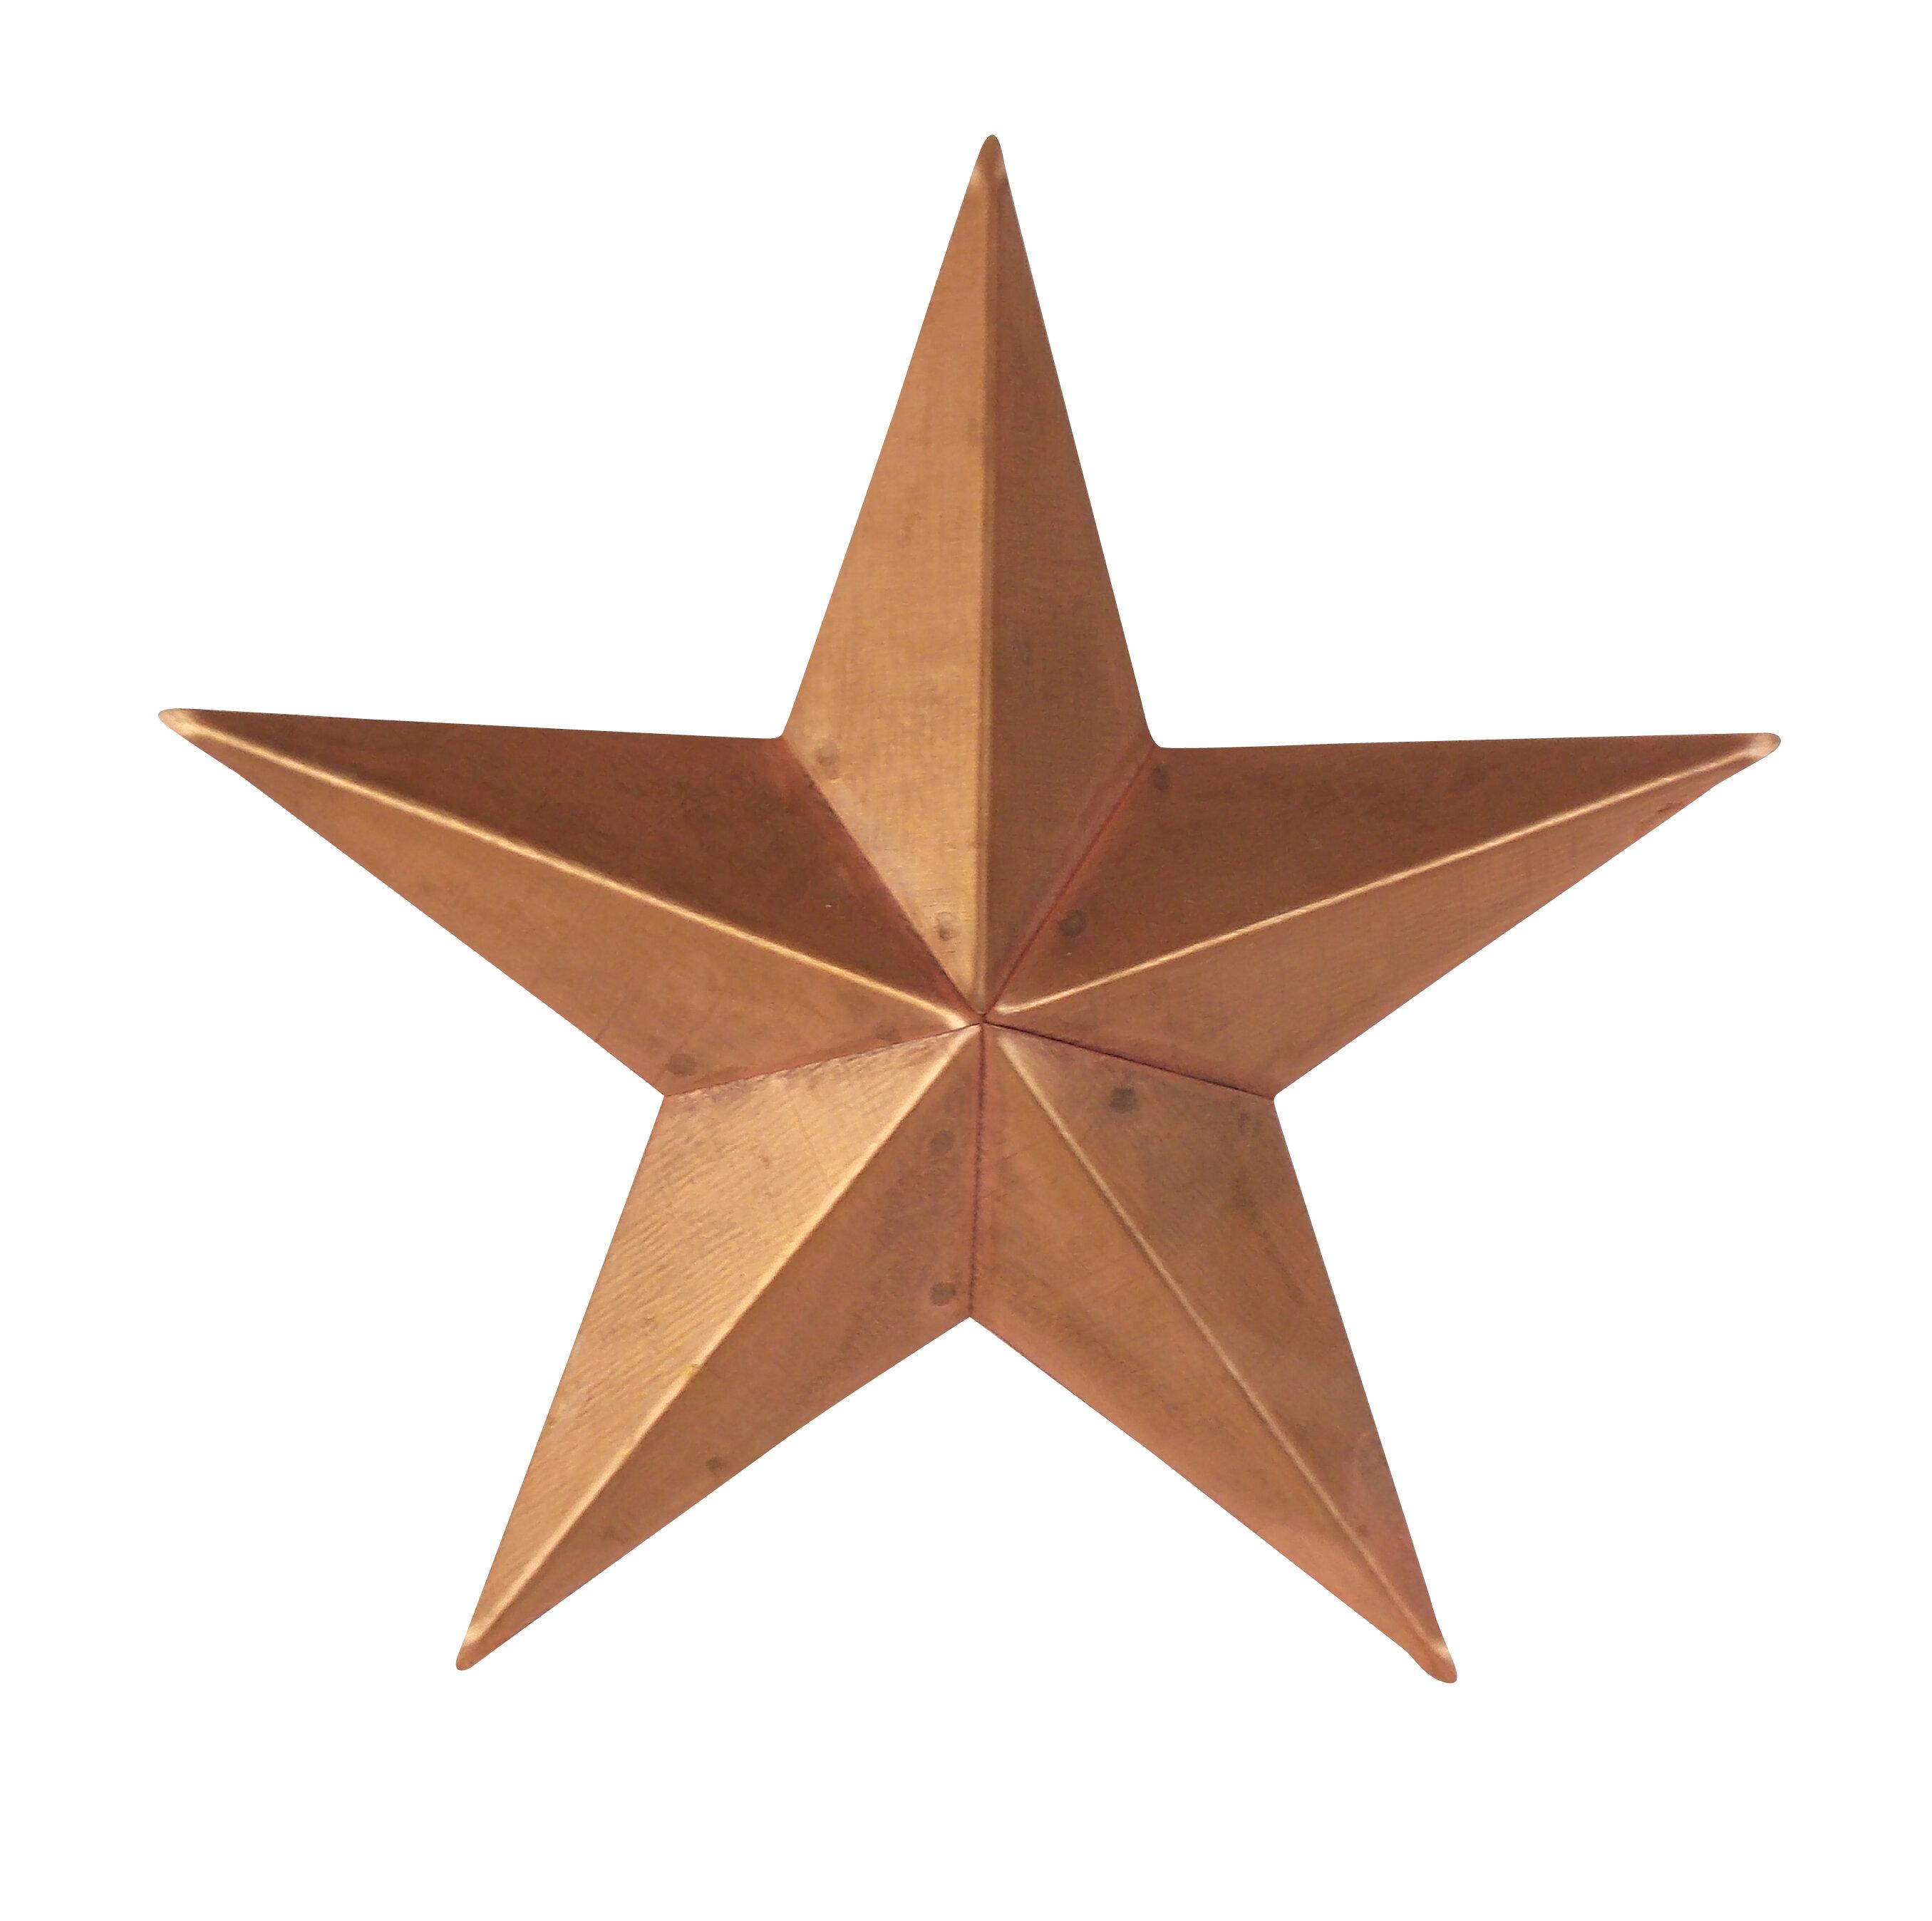 stars imports luxury star mirrored piece woodland wall reviews set of mirror art designs decor amp